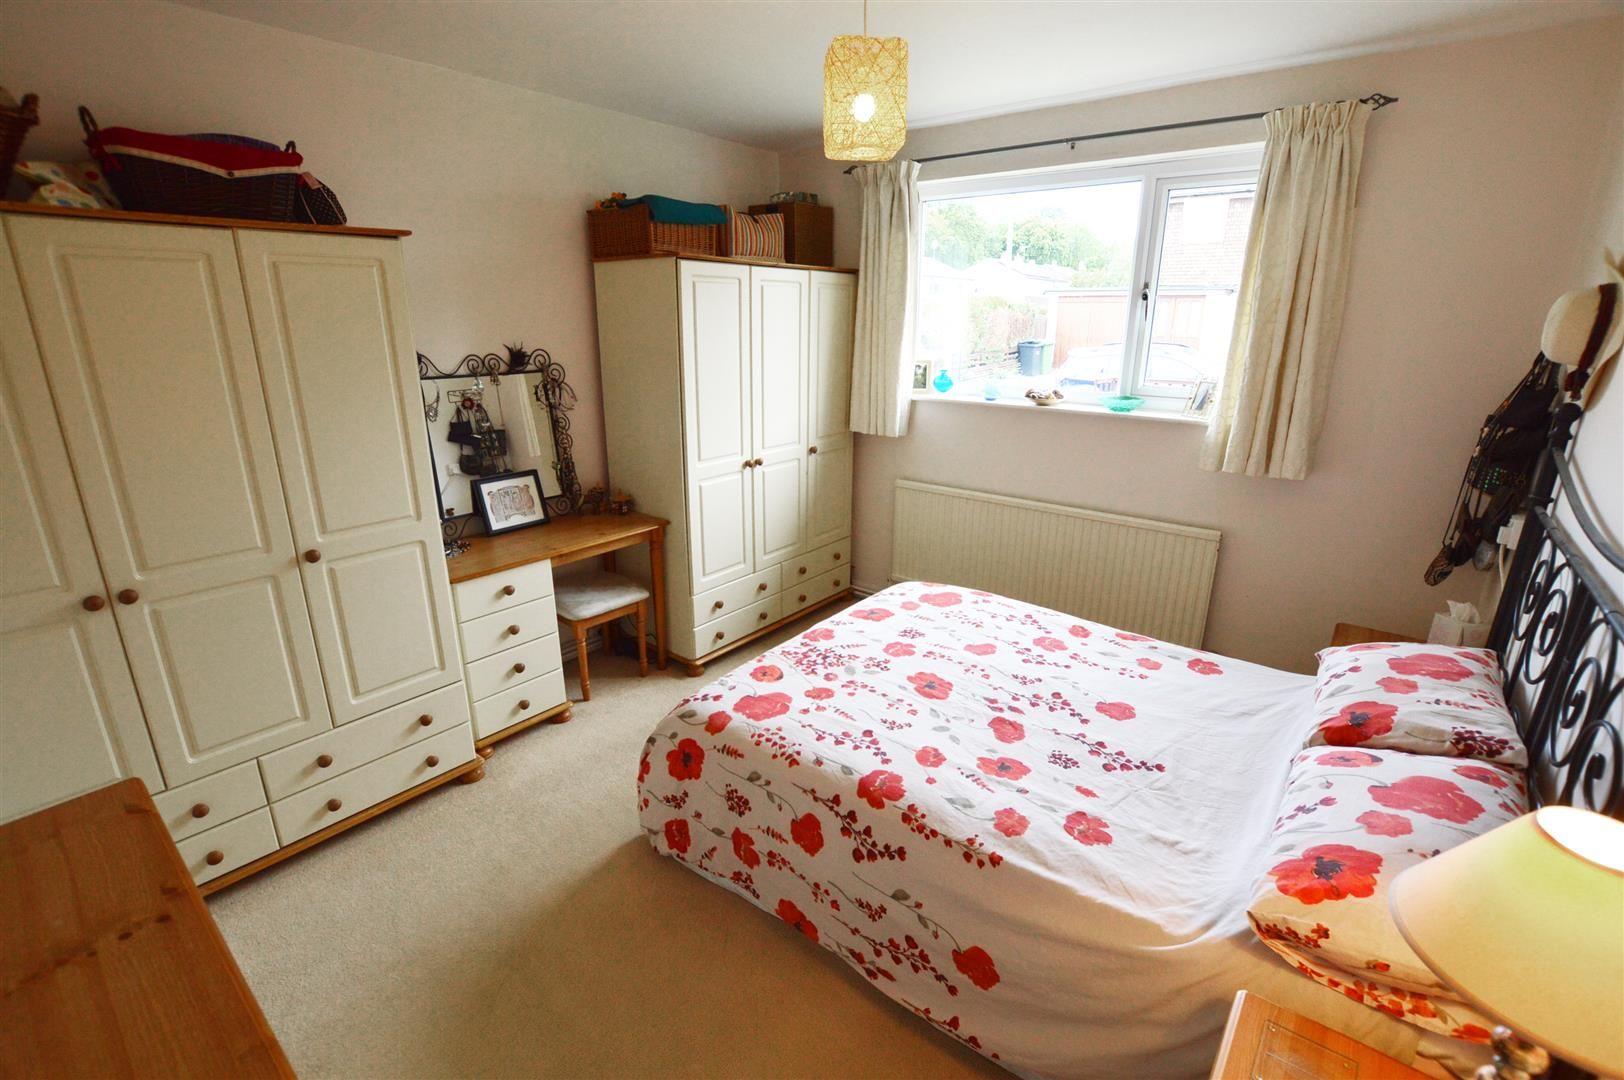 3 bed semi-detached-bungalow for sale in Shobdon 5